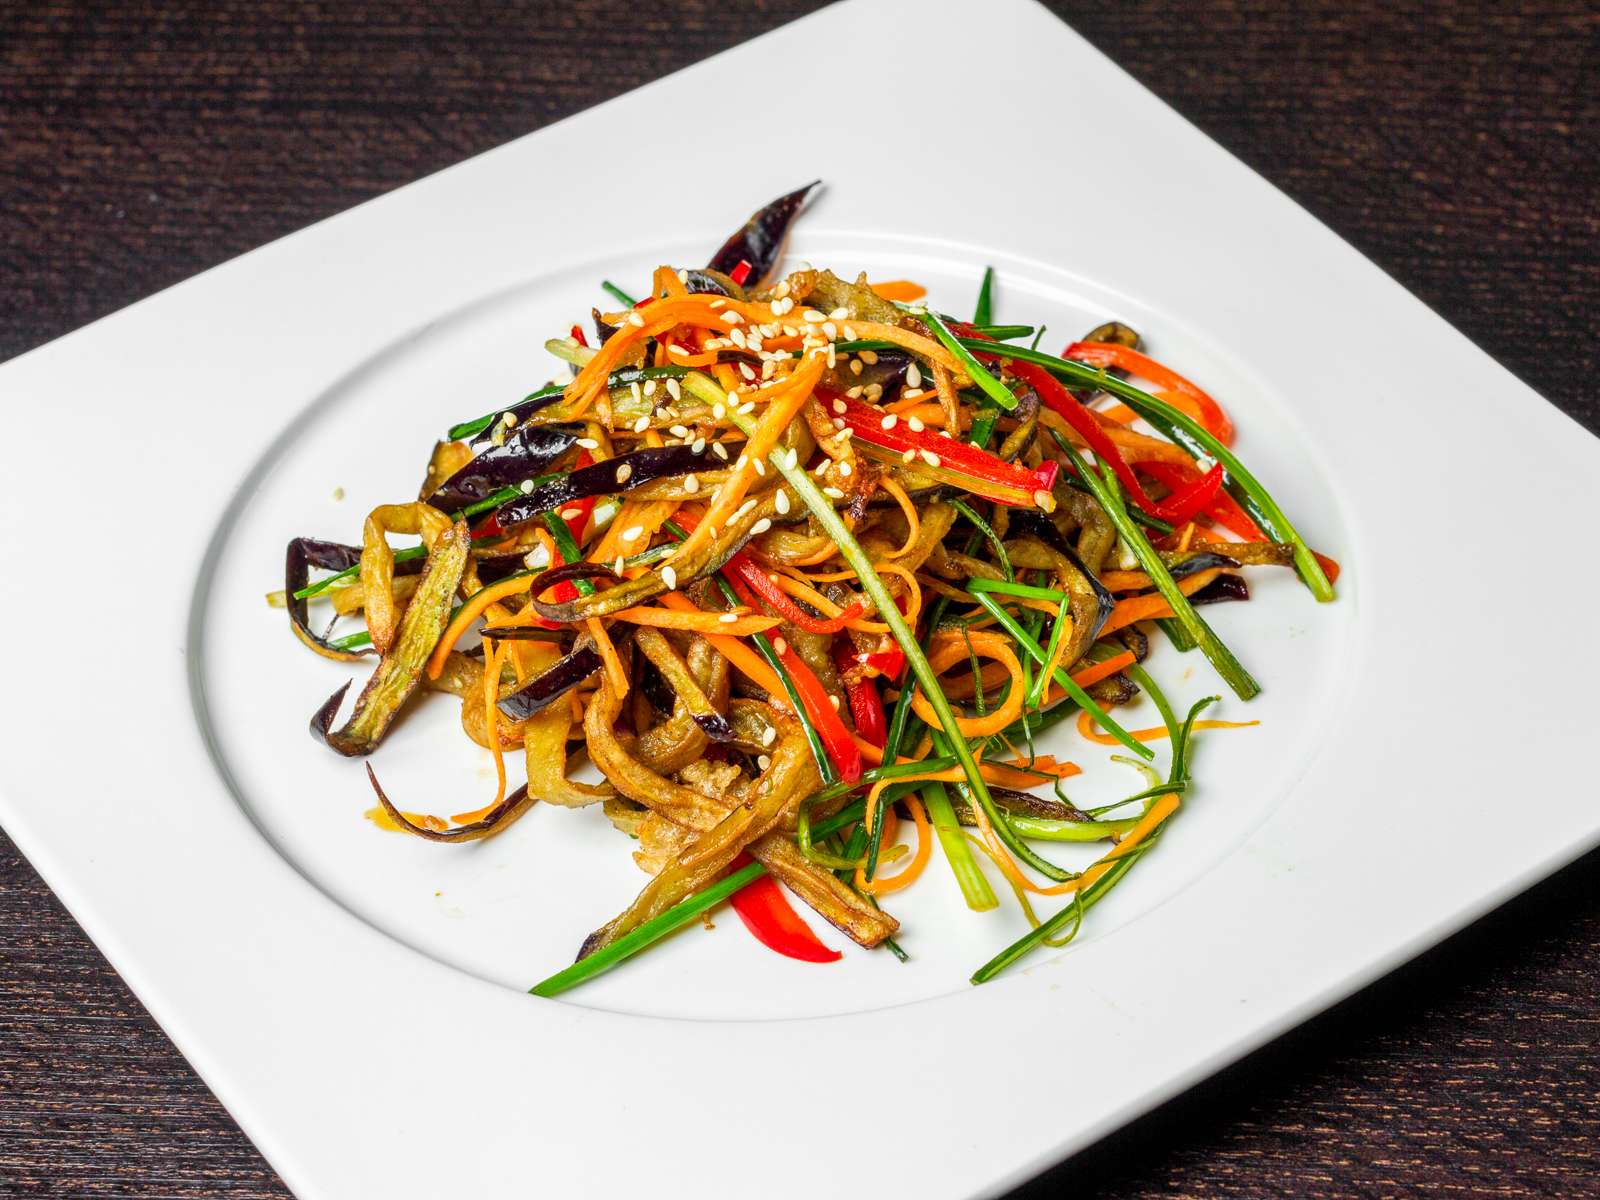 Салат с баклажаном и овощами